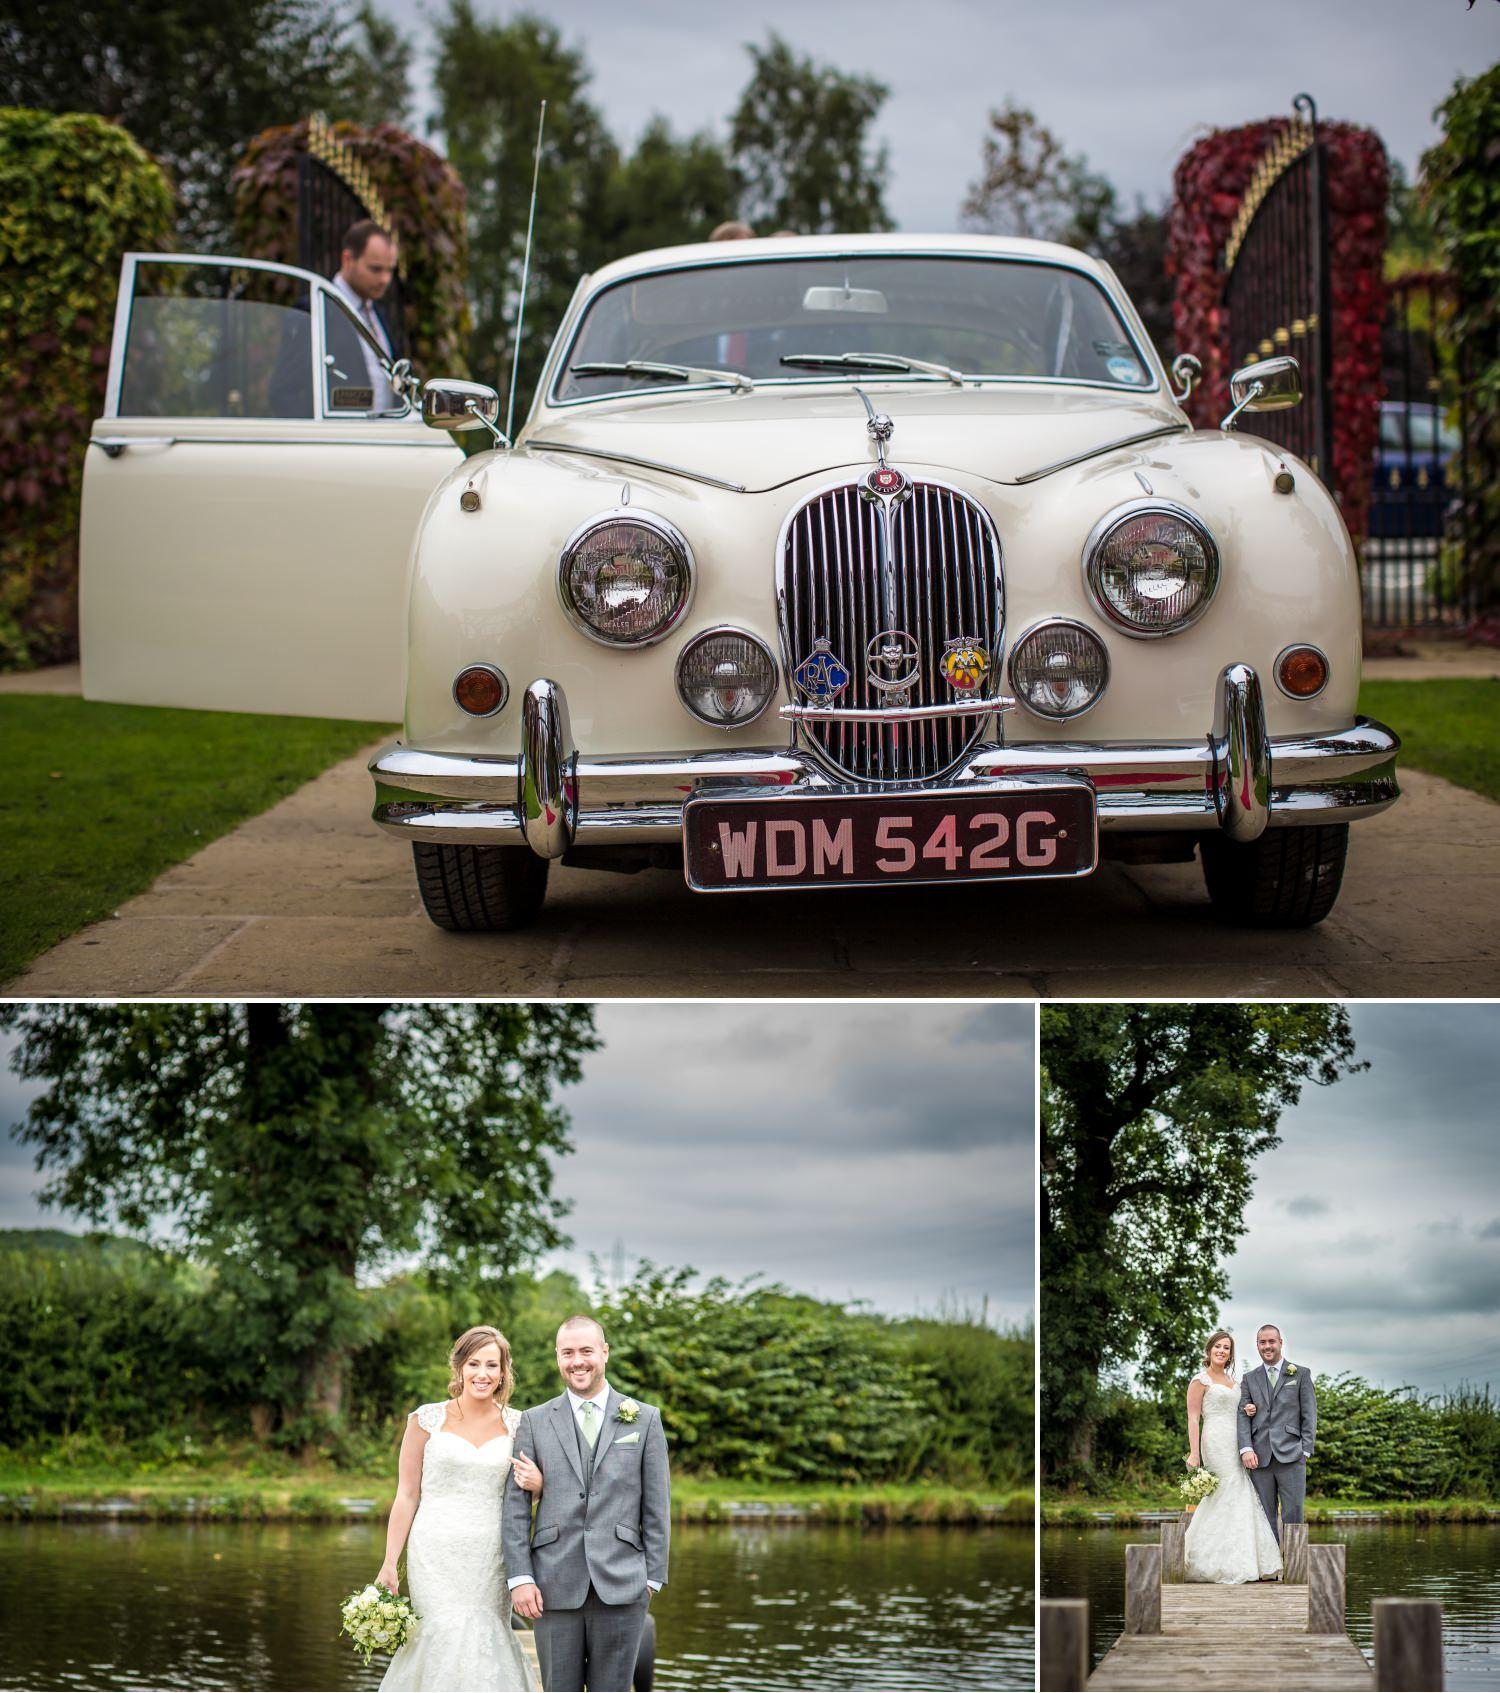 wedding car photograph at Lion Quays, Oswestry, Shropshire